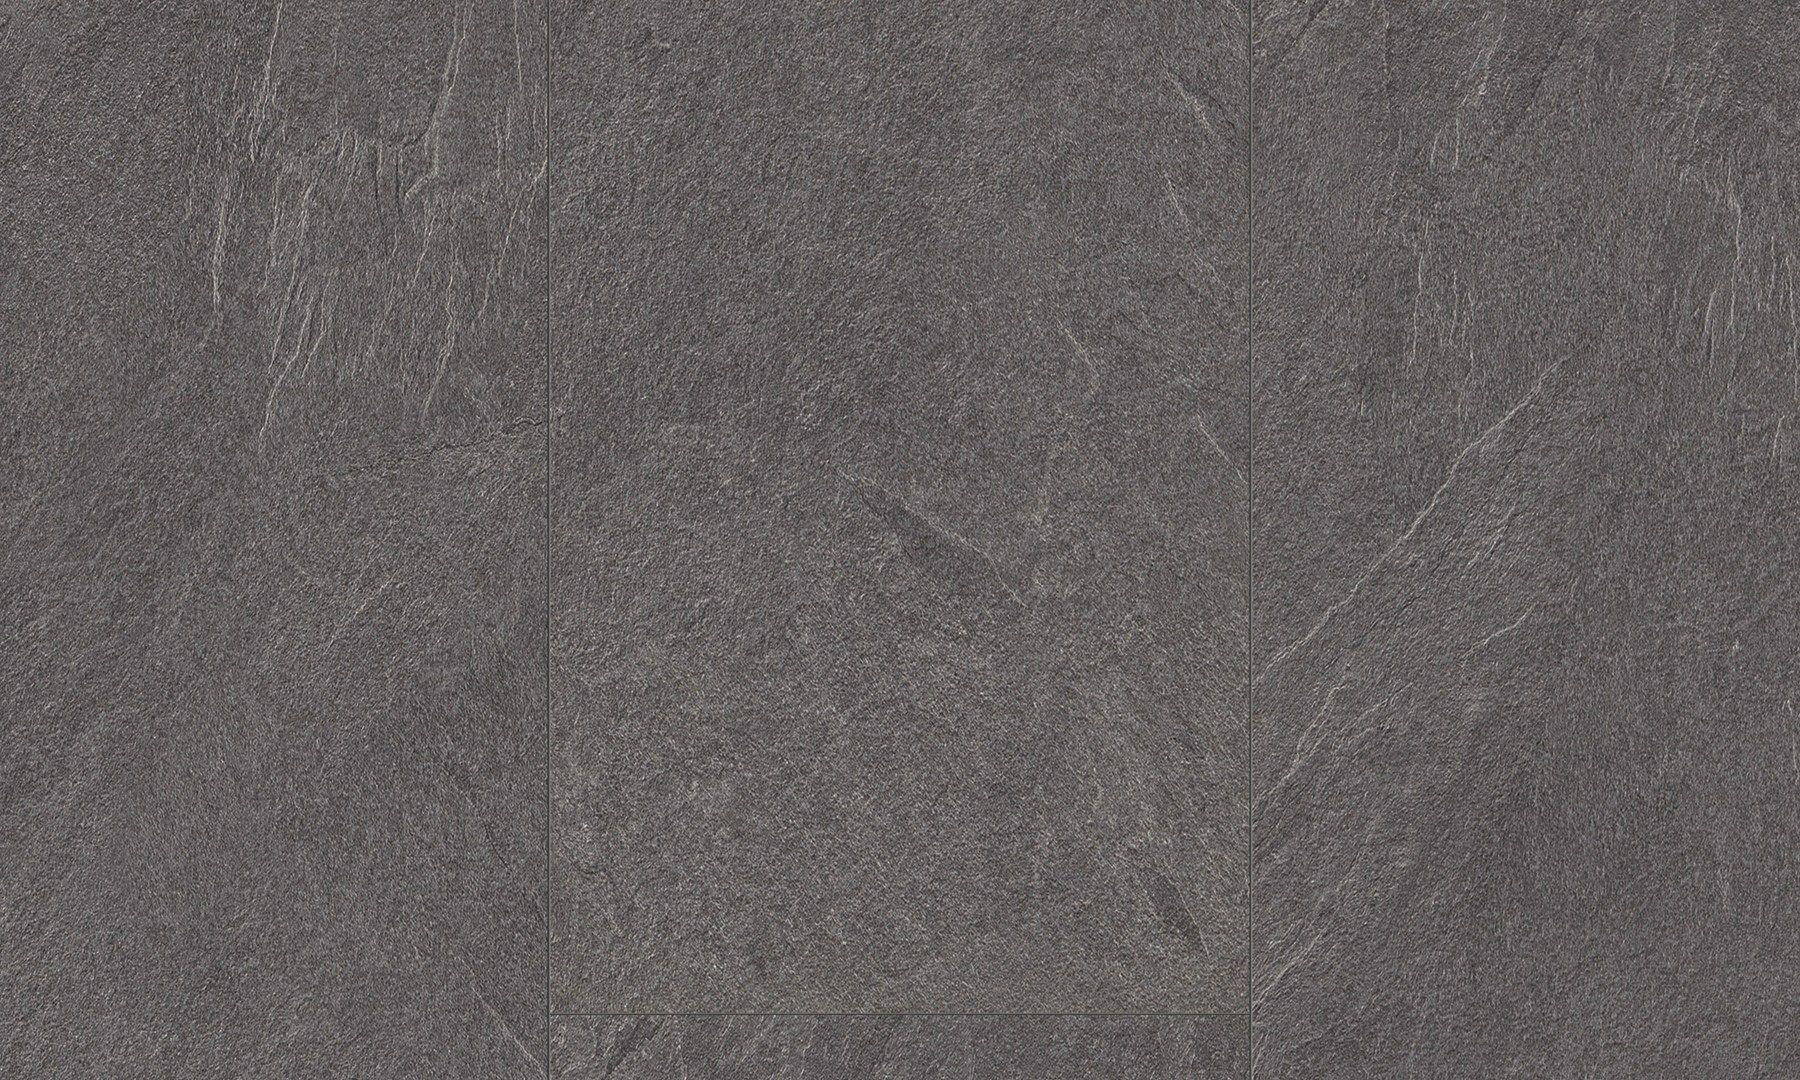 Pavimento laminato effetto pietra by pergo pietra texture e pants